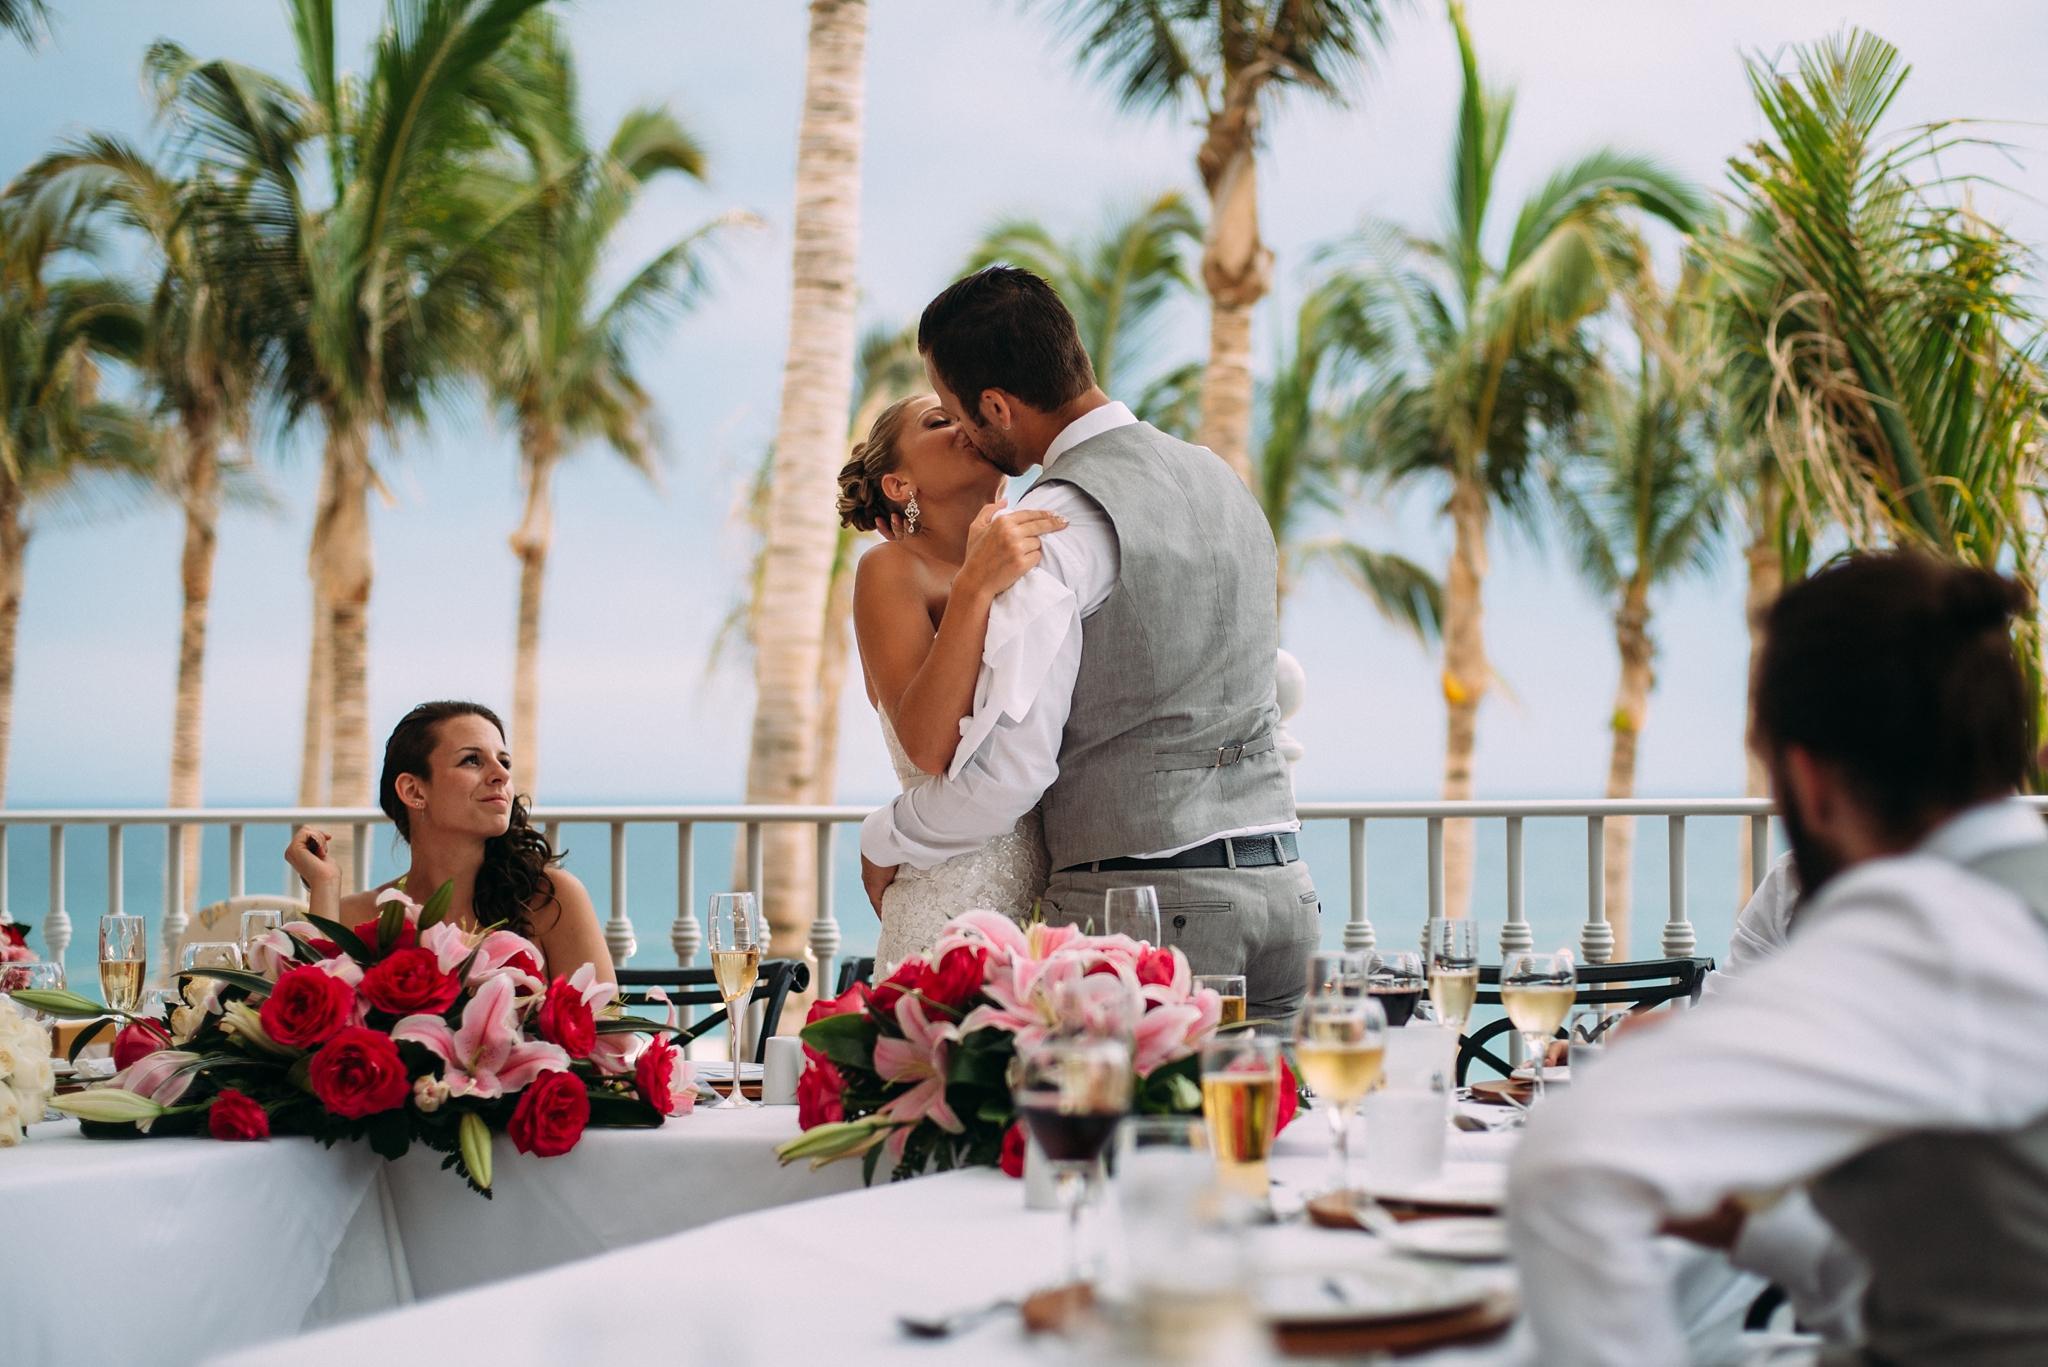 kaihla_tonai_intimate_wedding_elopement_photographer_1384